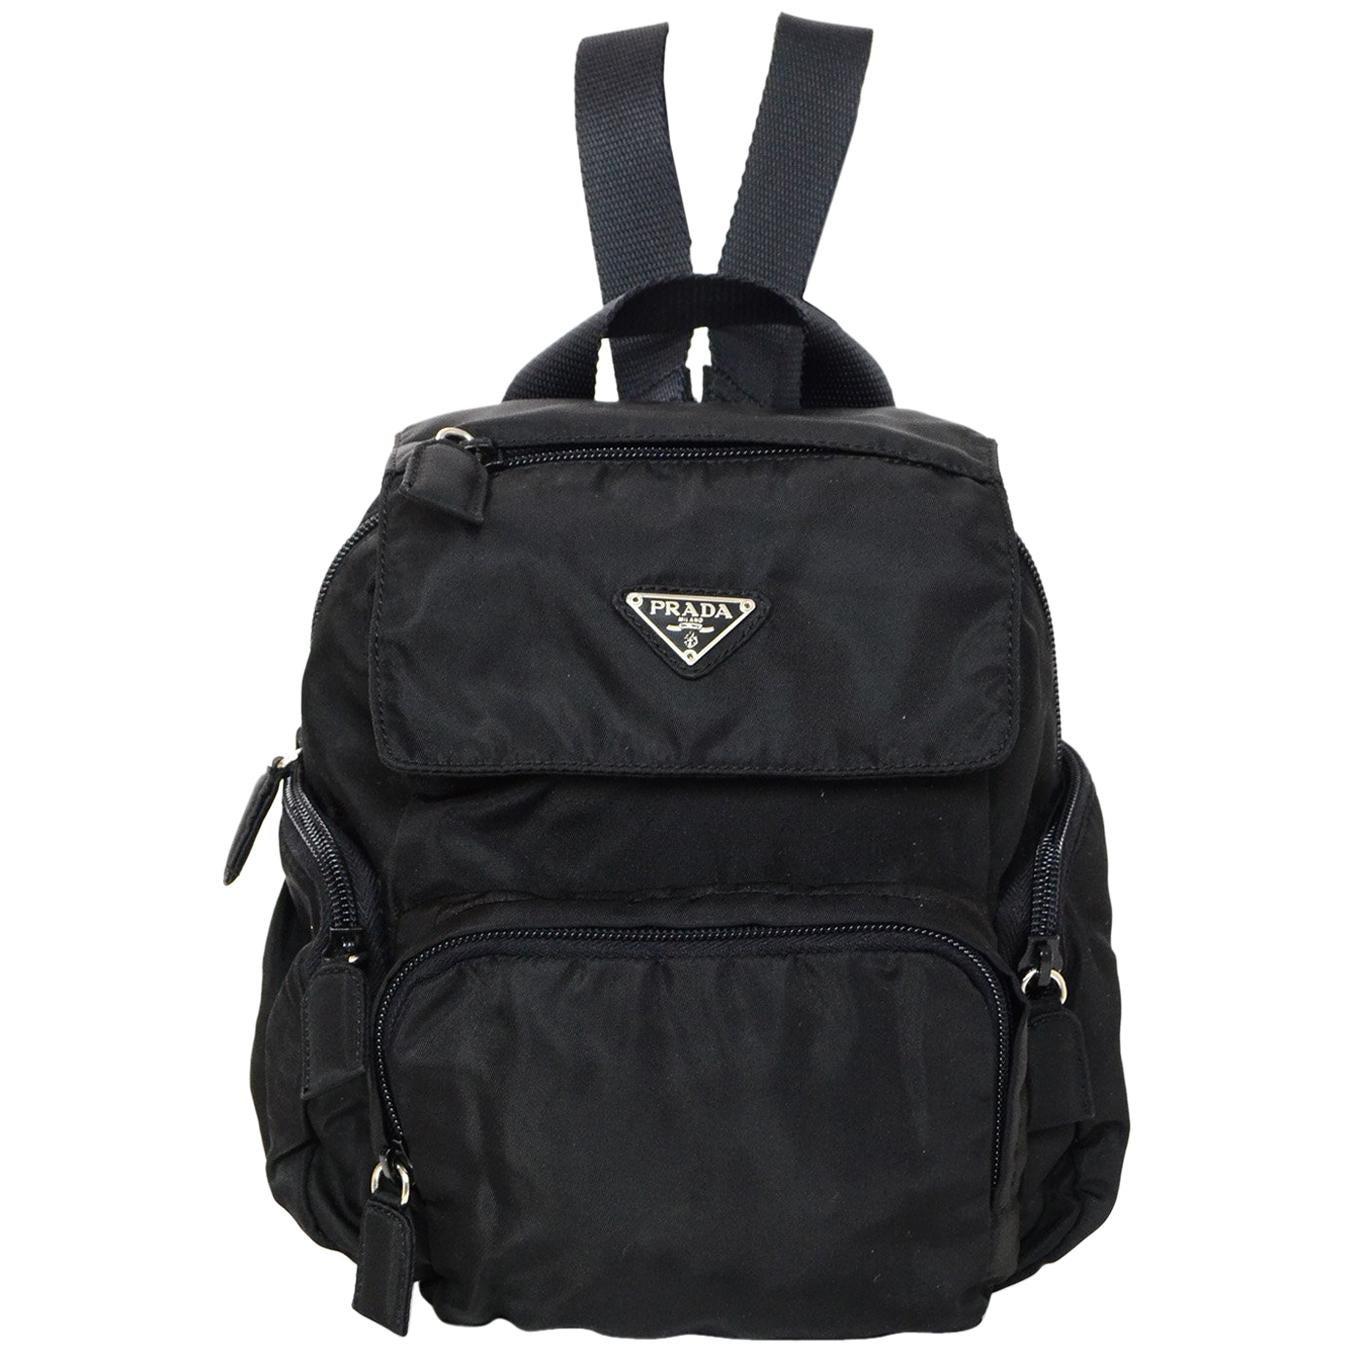 c8bc10915 ... promo code for prada black nylon mini backpack bag w zip pockets for  sale 9050f b20de